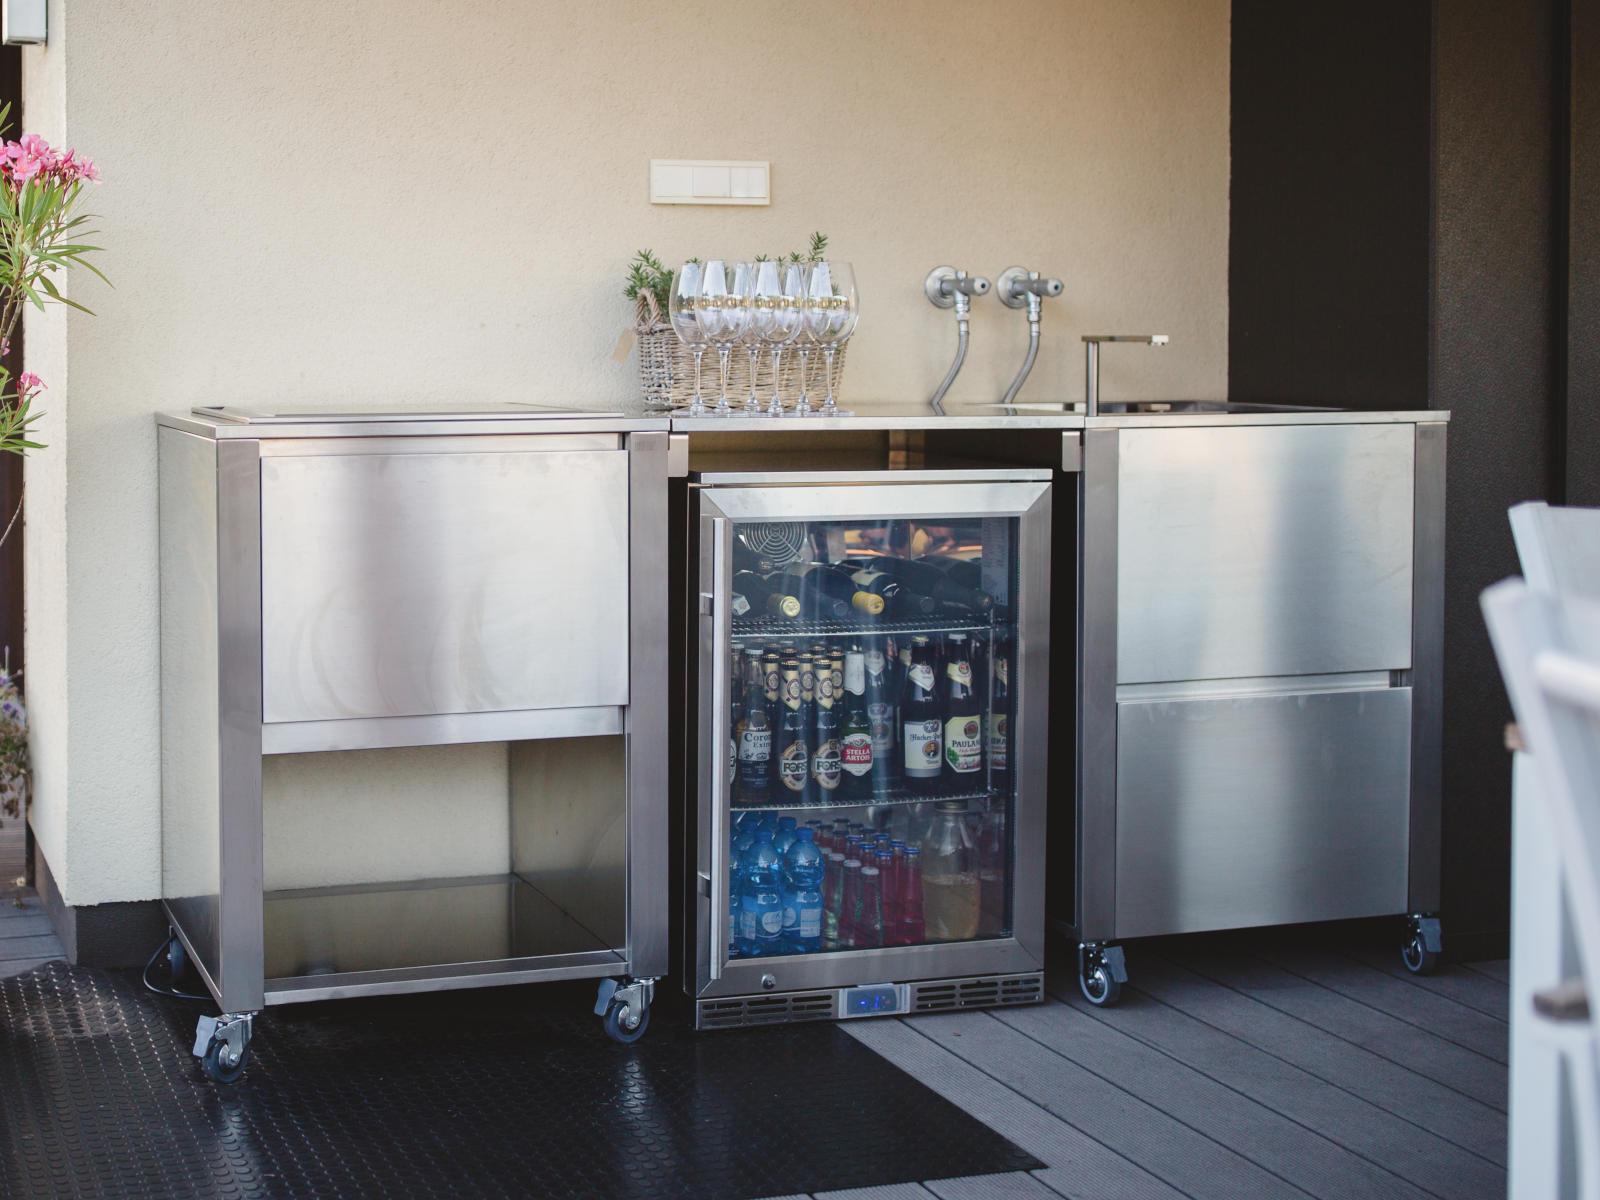 Kühlschrank Outdoor : Kühlschrank outdoor küche holzkohle vs gas erstaunlich outdoor